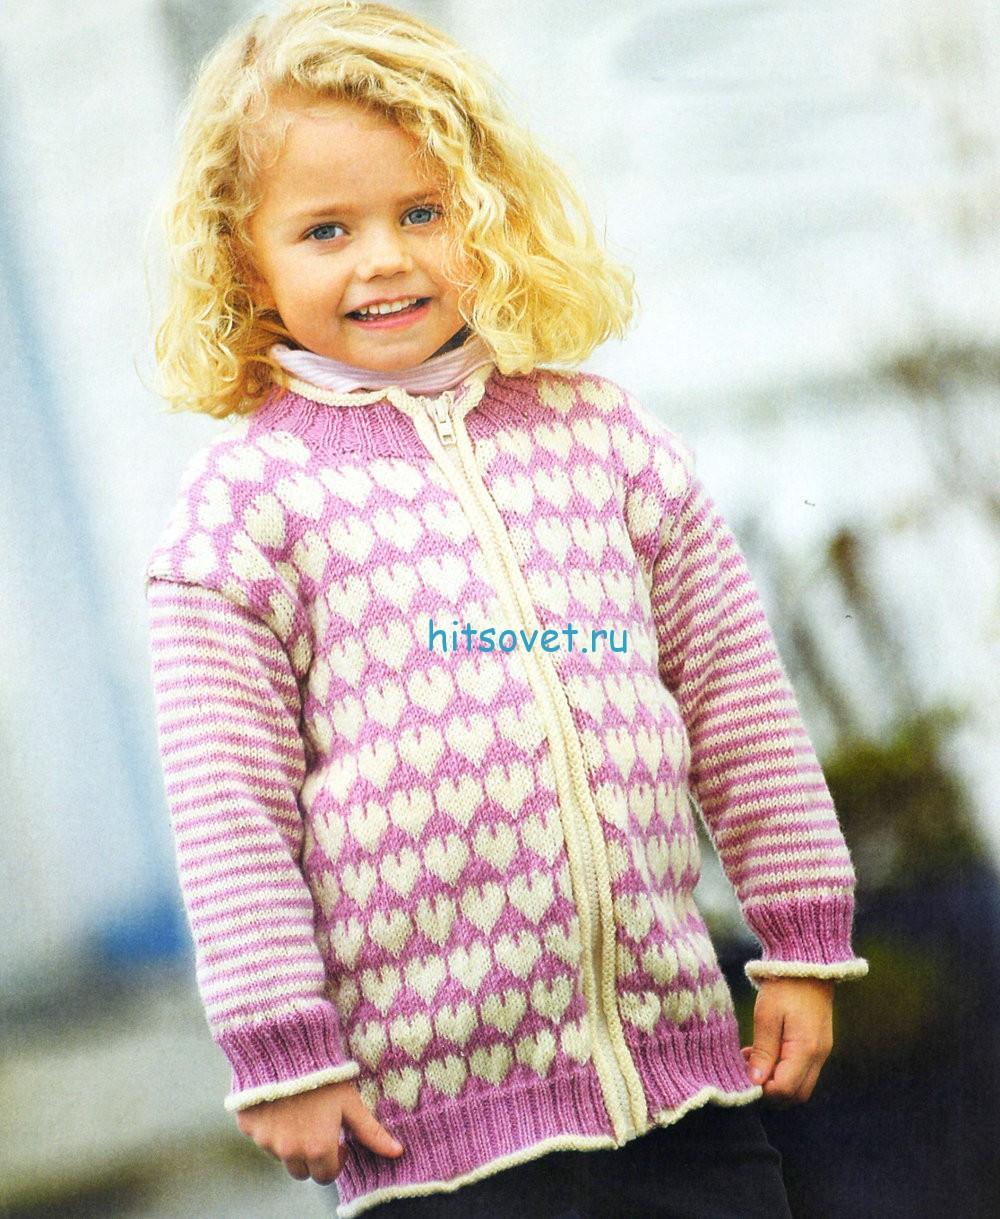 Вязание для девочки жакета с сердечками